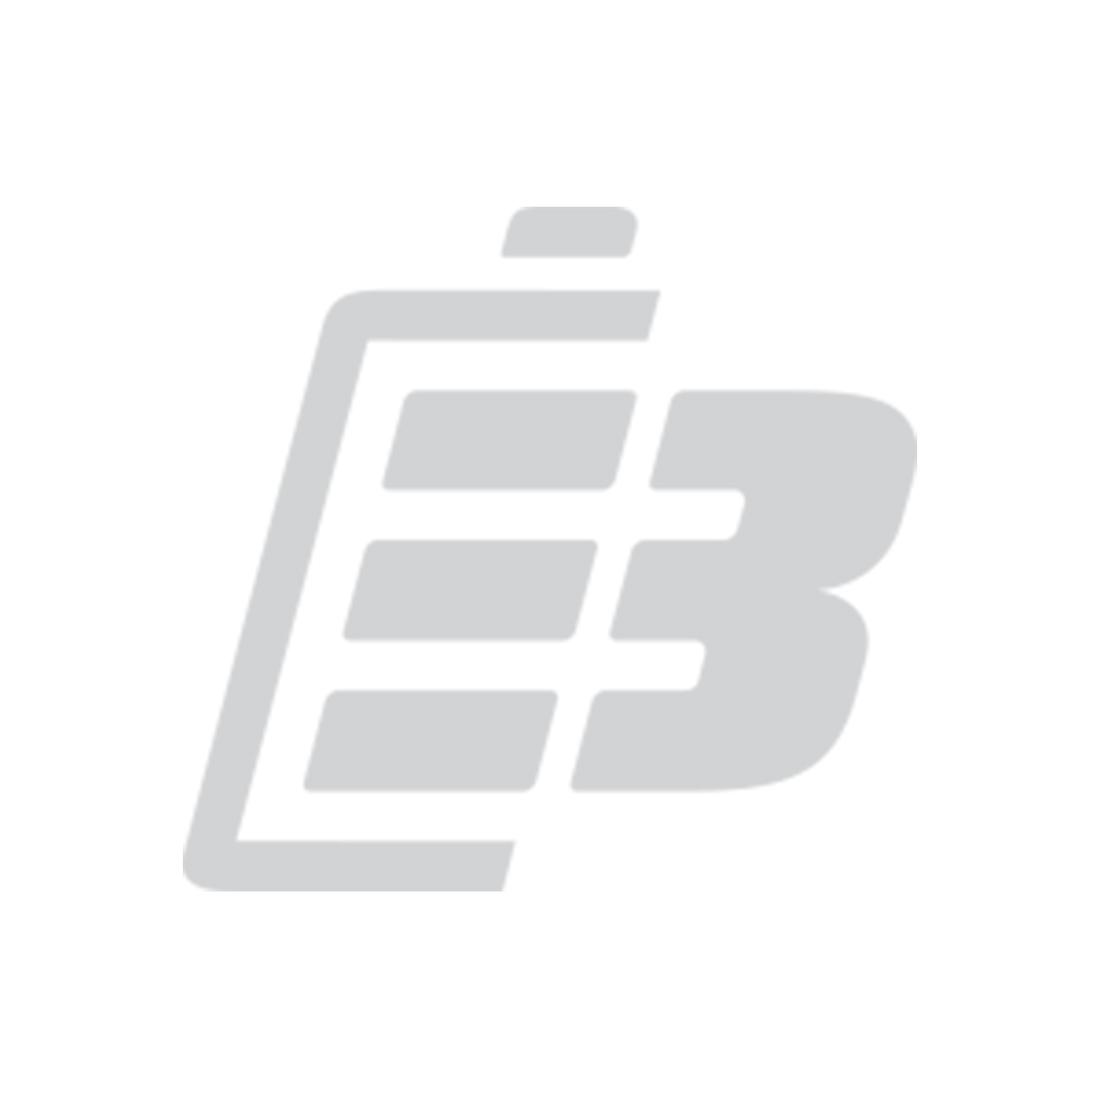 Fenix CL30R LED camping lantern 1